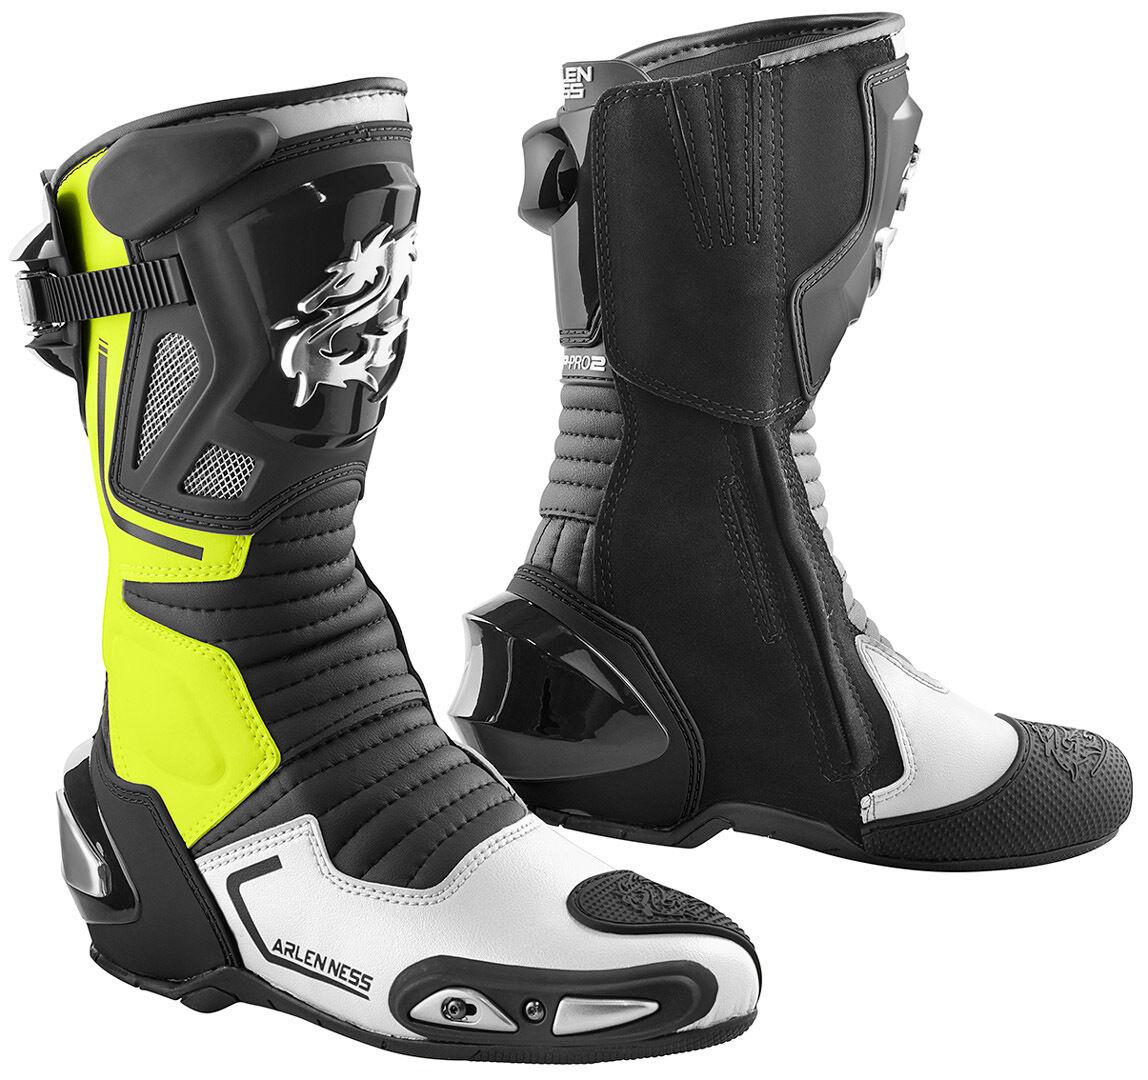 Arlen Ness Sugello Bottes de moto Noir Jaune taille : 45